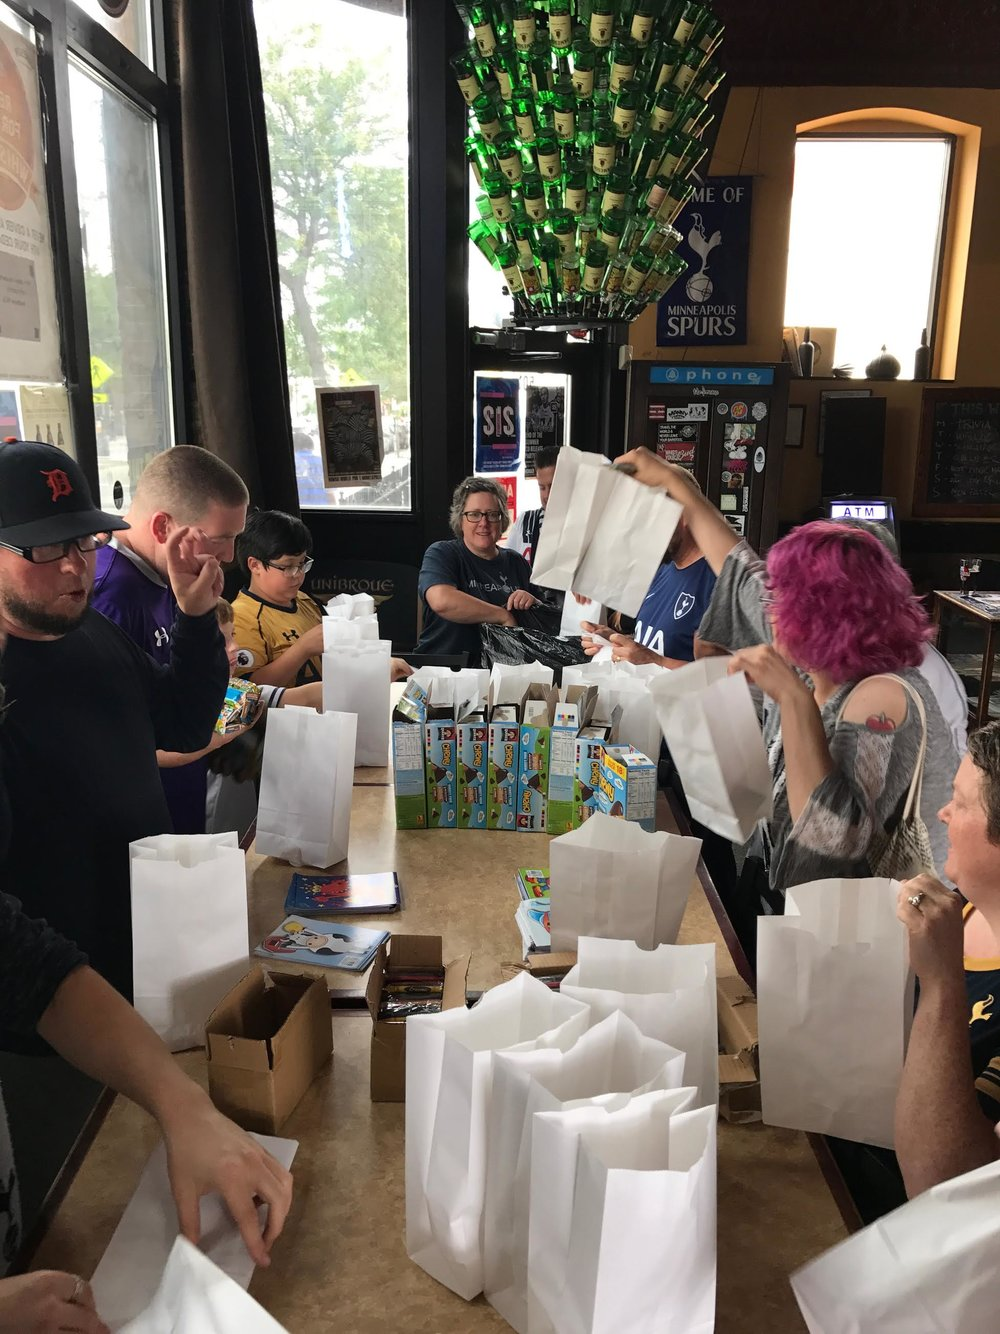 Club members preparing craft packs for the kids!